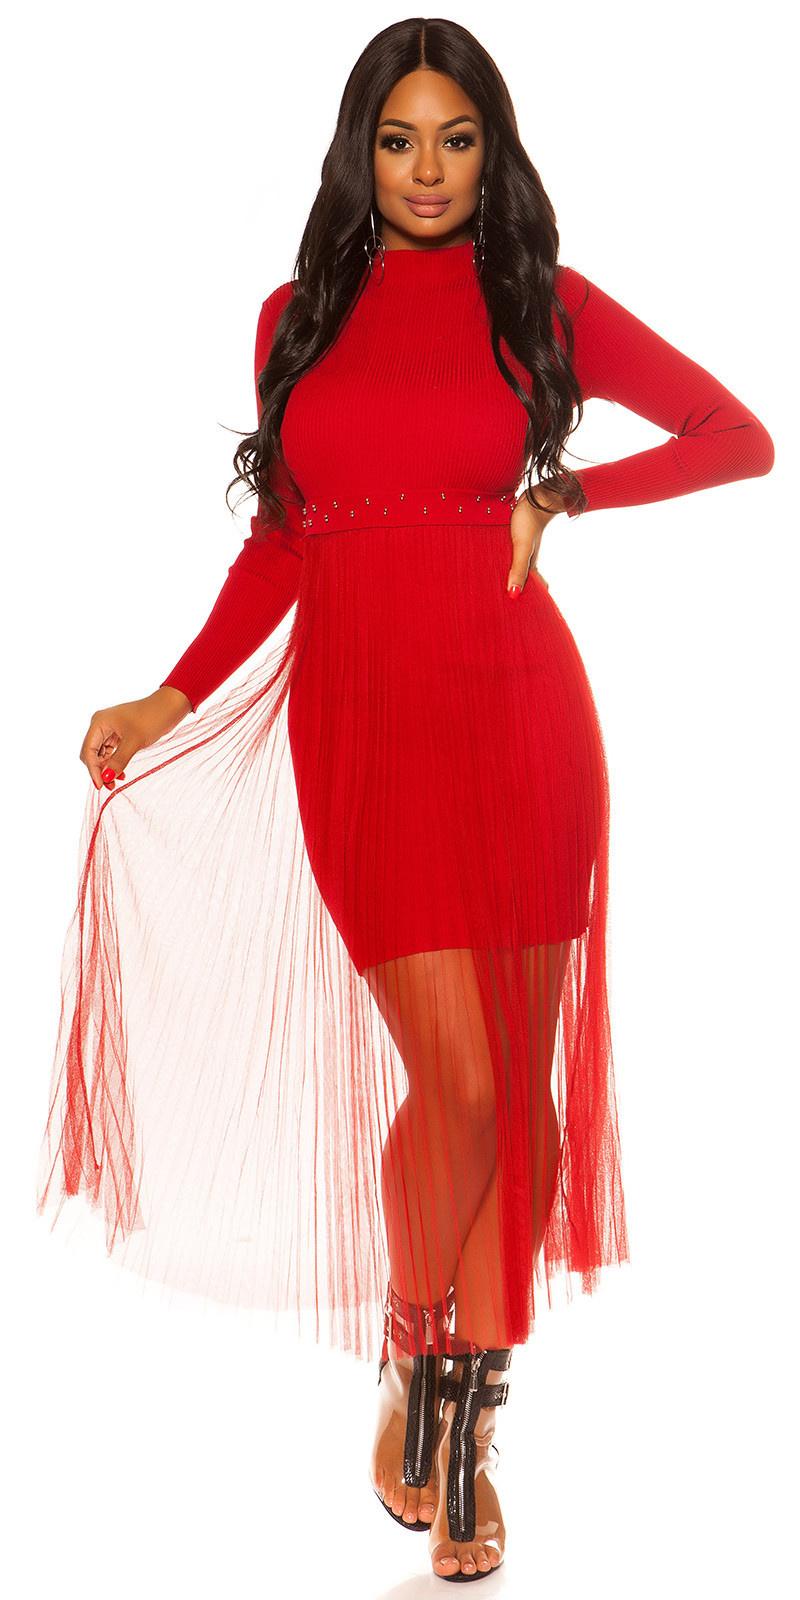 Sexy rib gebreide jurk met chiffon overrok rood